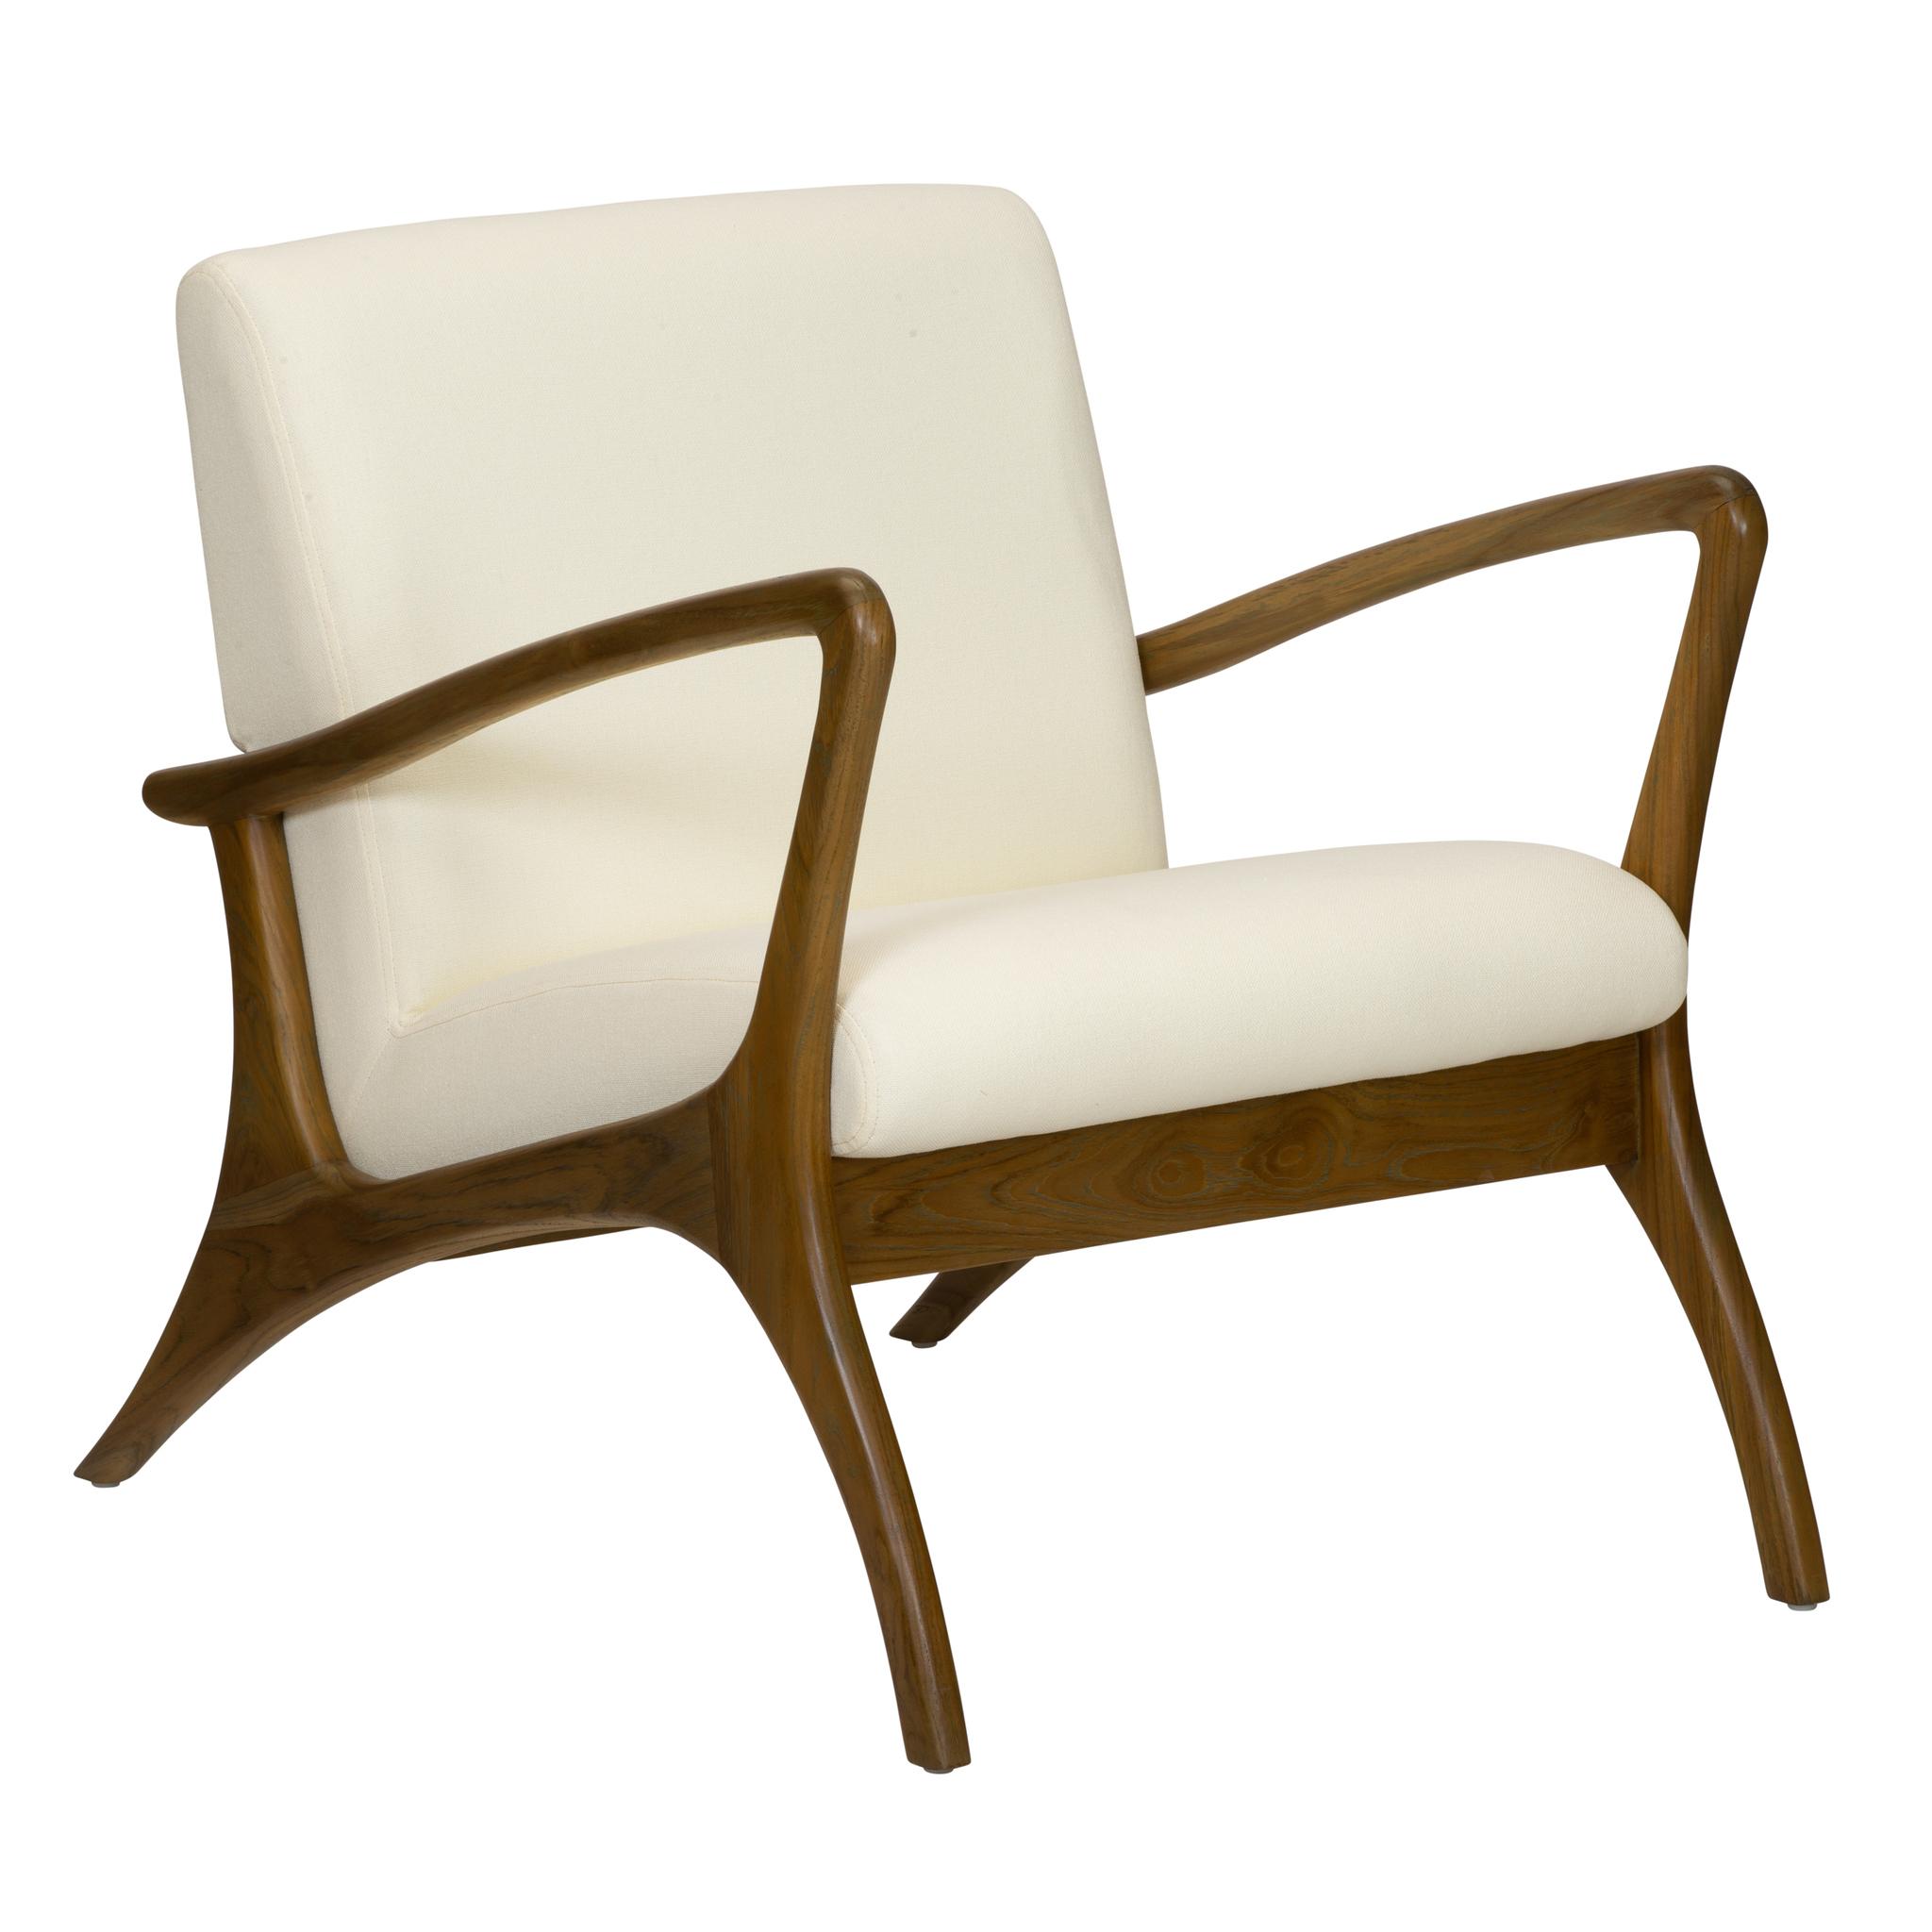 Soren Coffee In Designs Tables Natural Ventura Lounge Selamat Chair tsQxCrhd